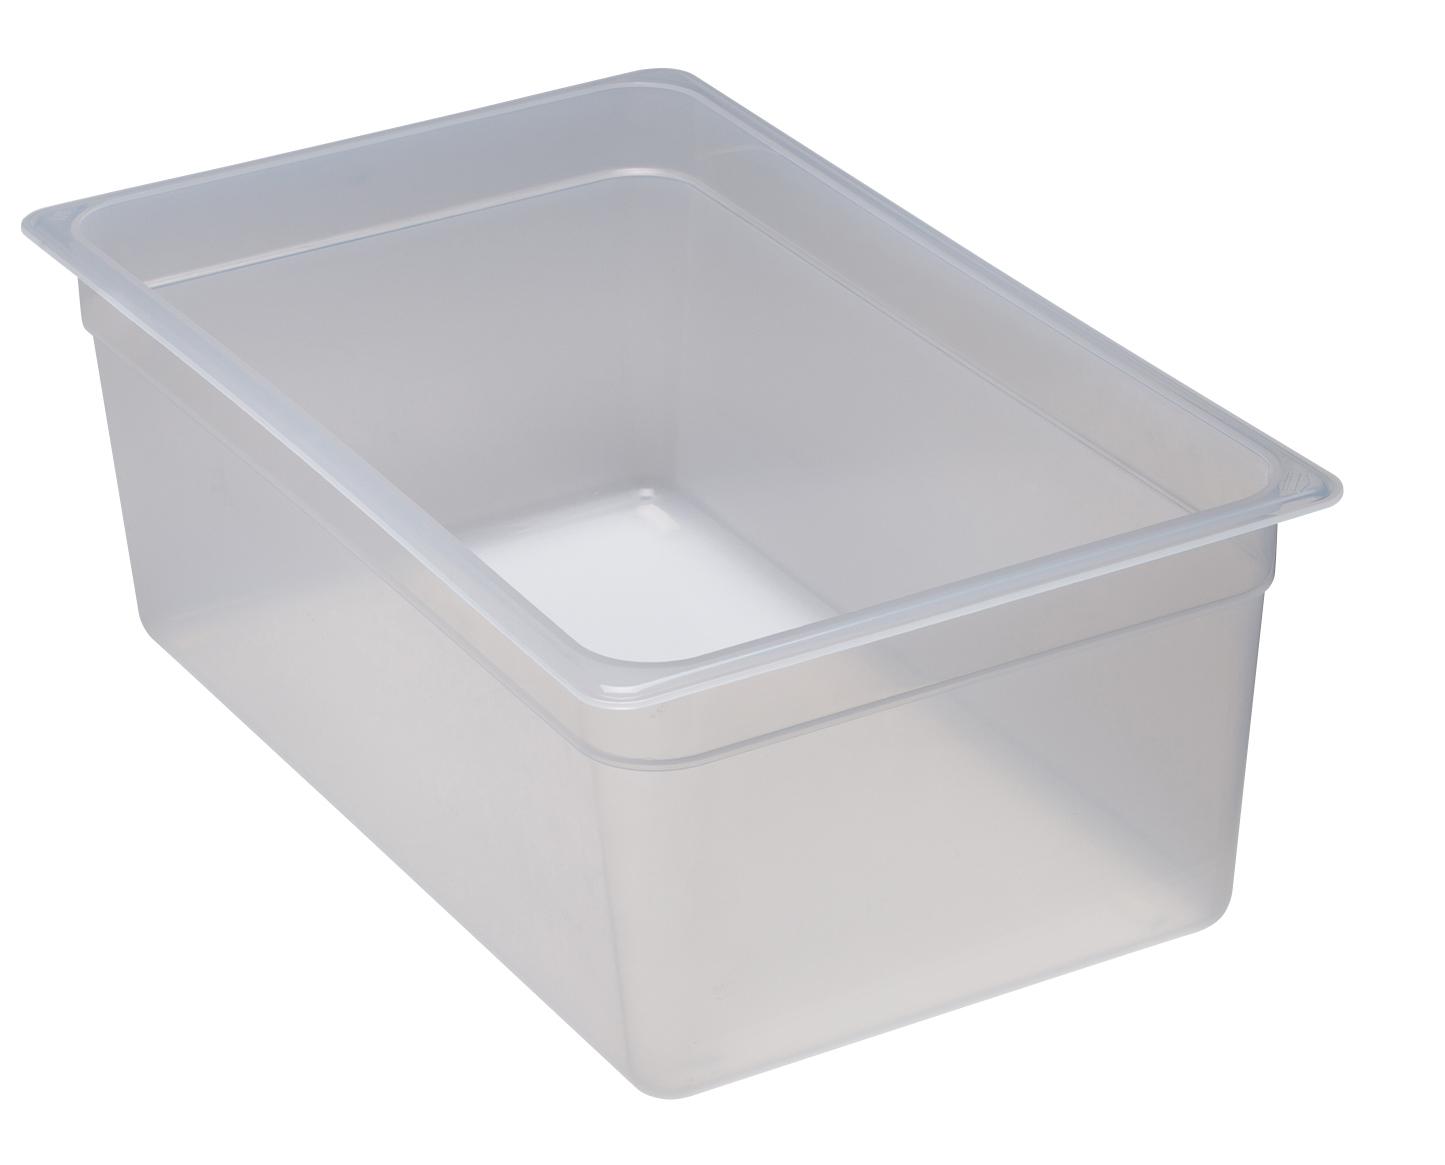 Cambro 18PP190 food/beverage storage container